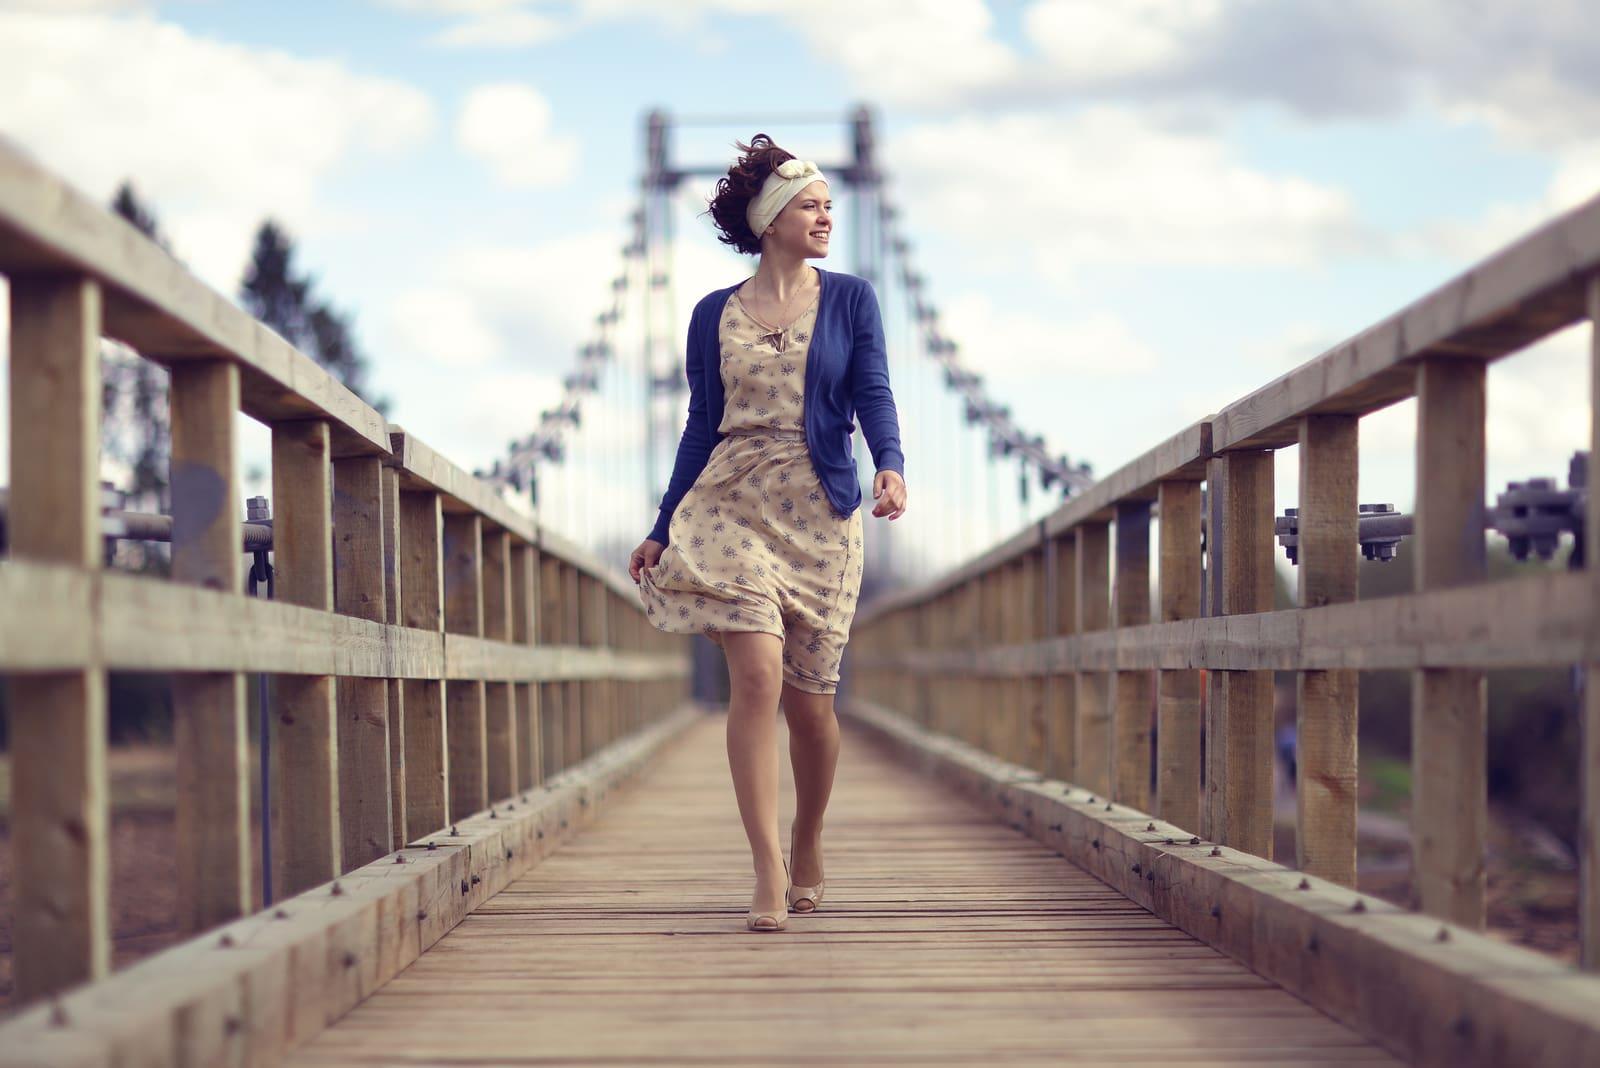 a woman walks across the bridge